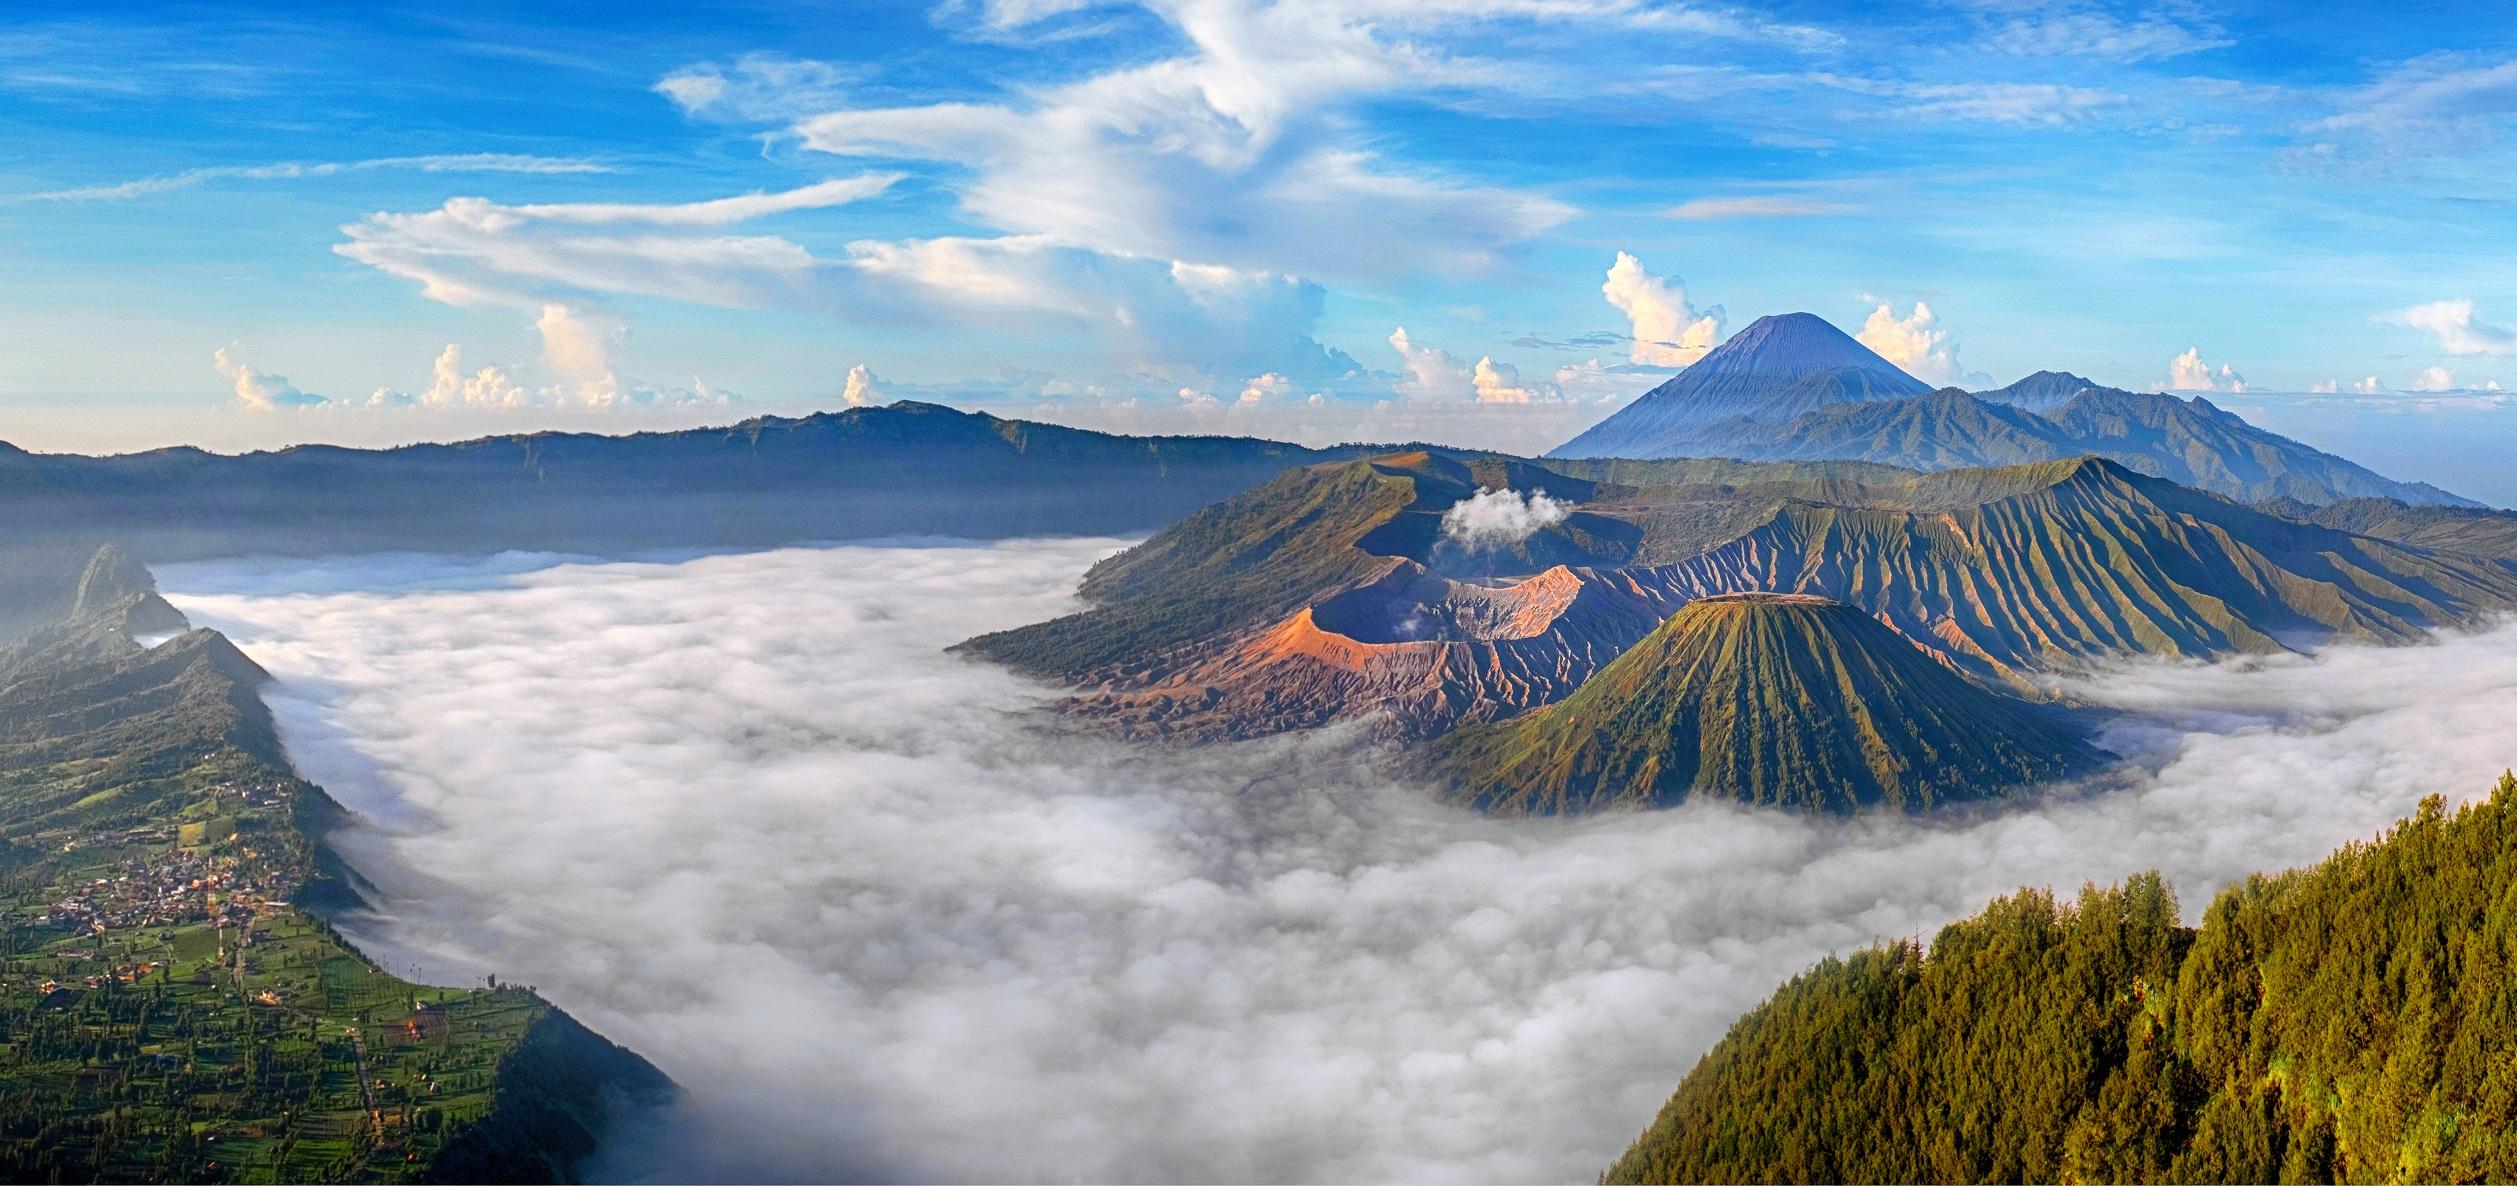 the bromo volcano